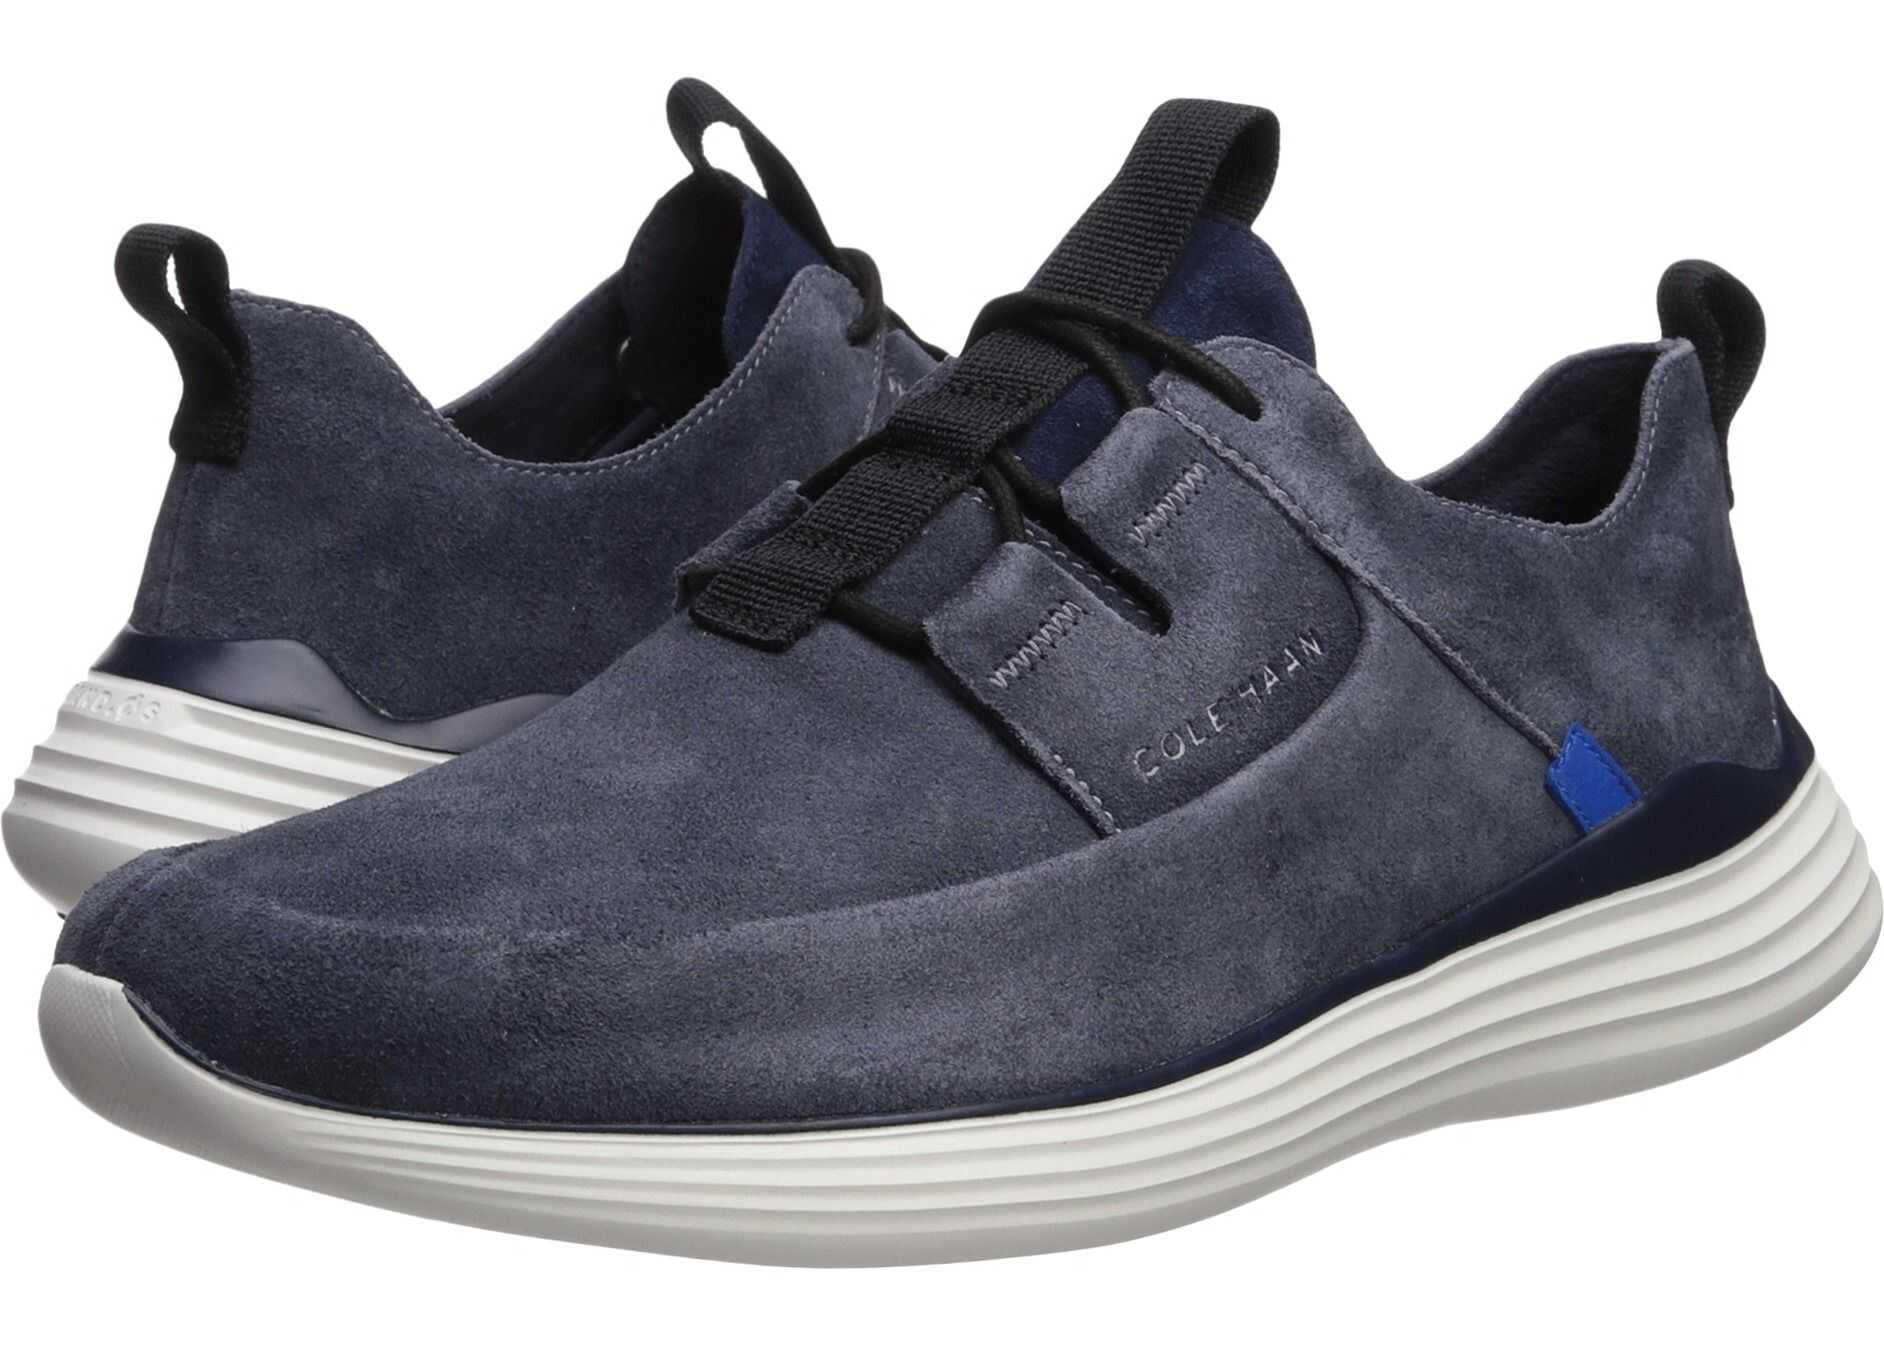 Cole Haan Grandsport Apron Toe Sneaker Ombre Blue/Optic White